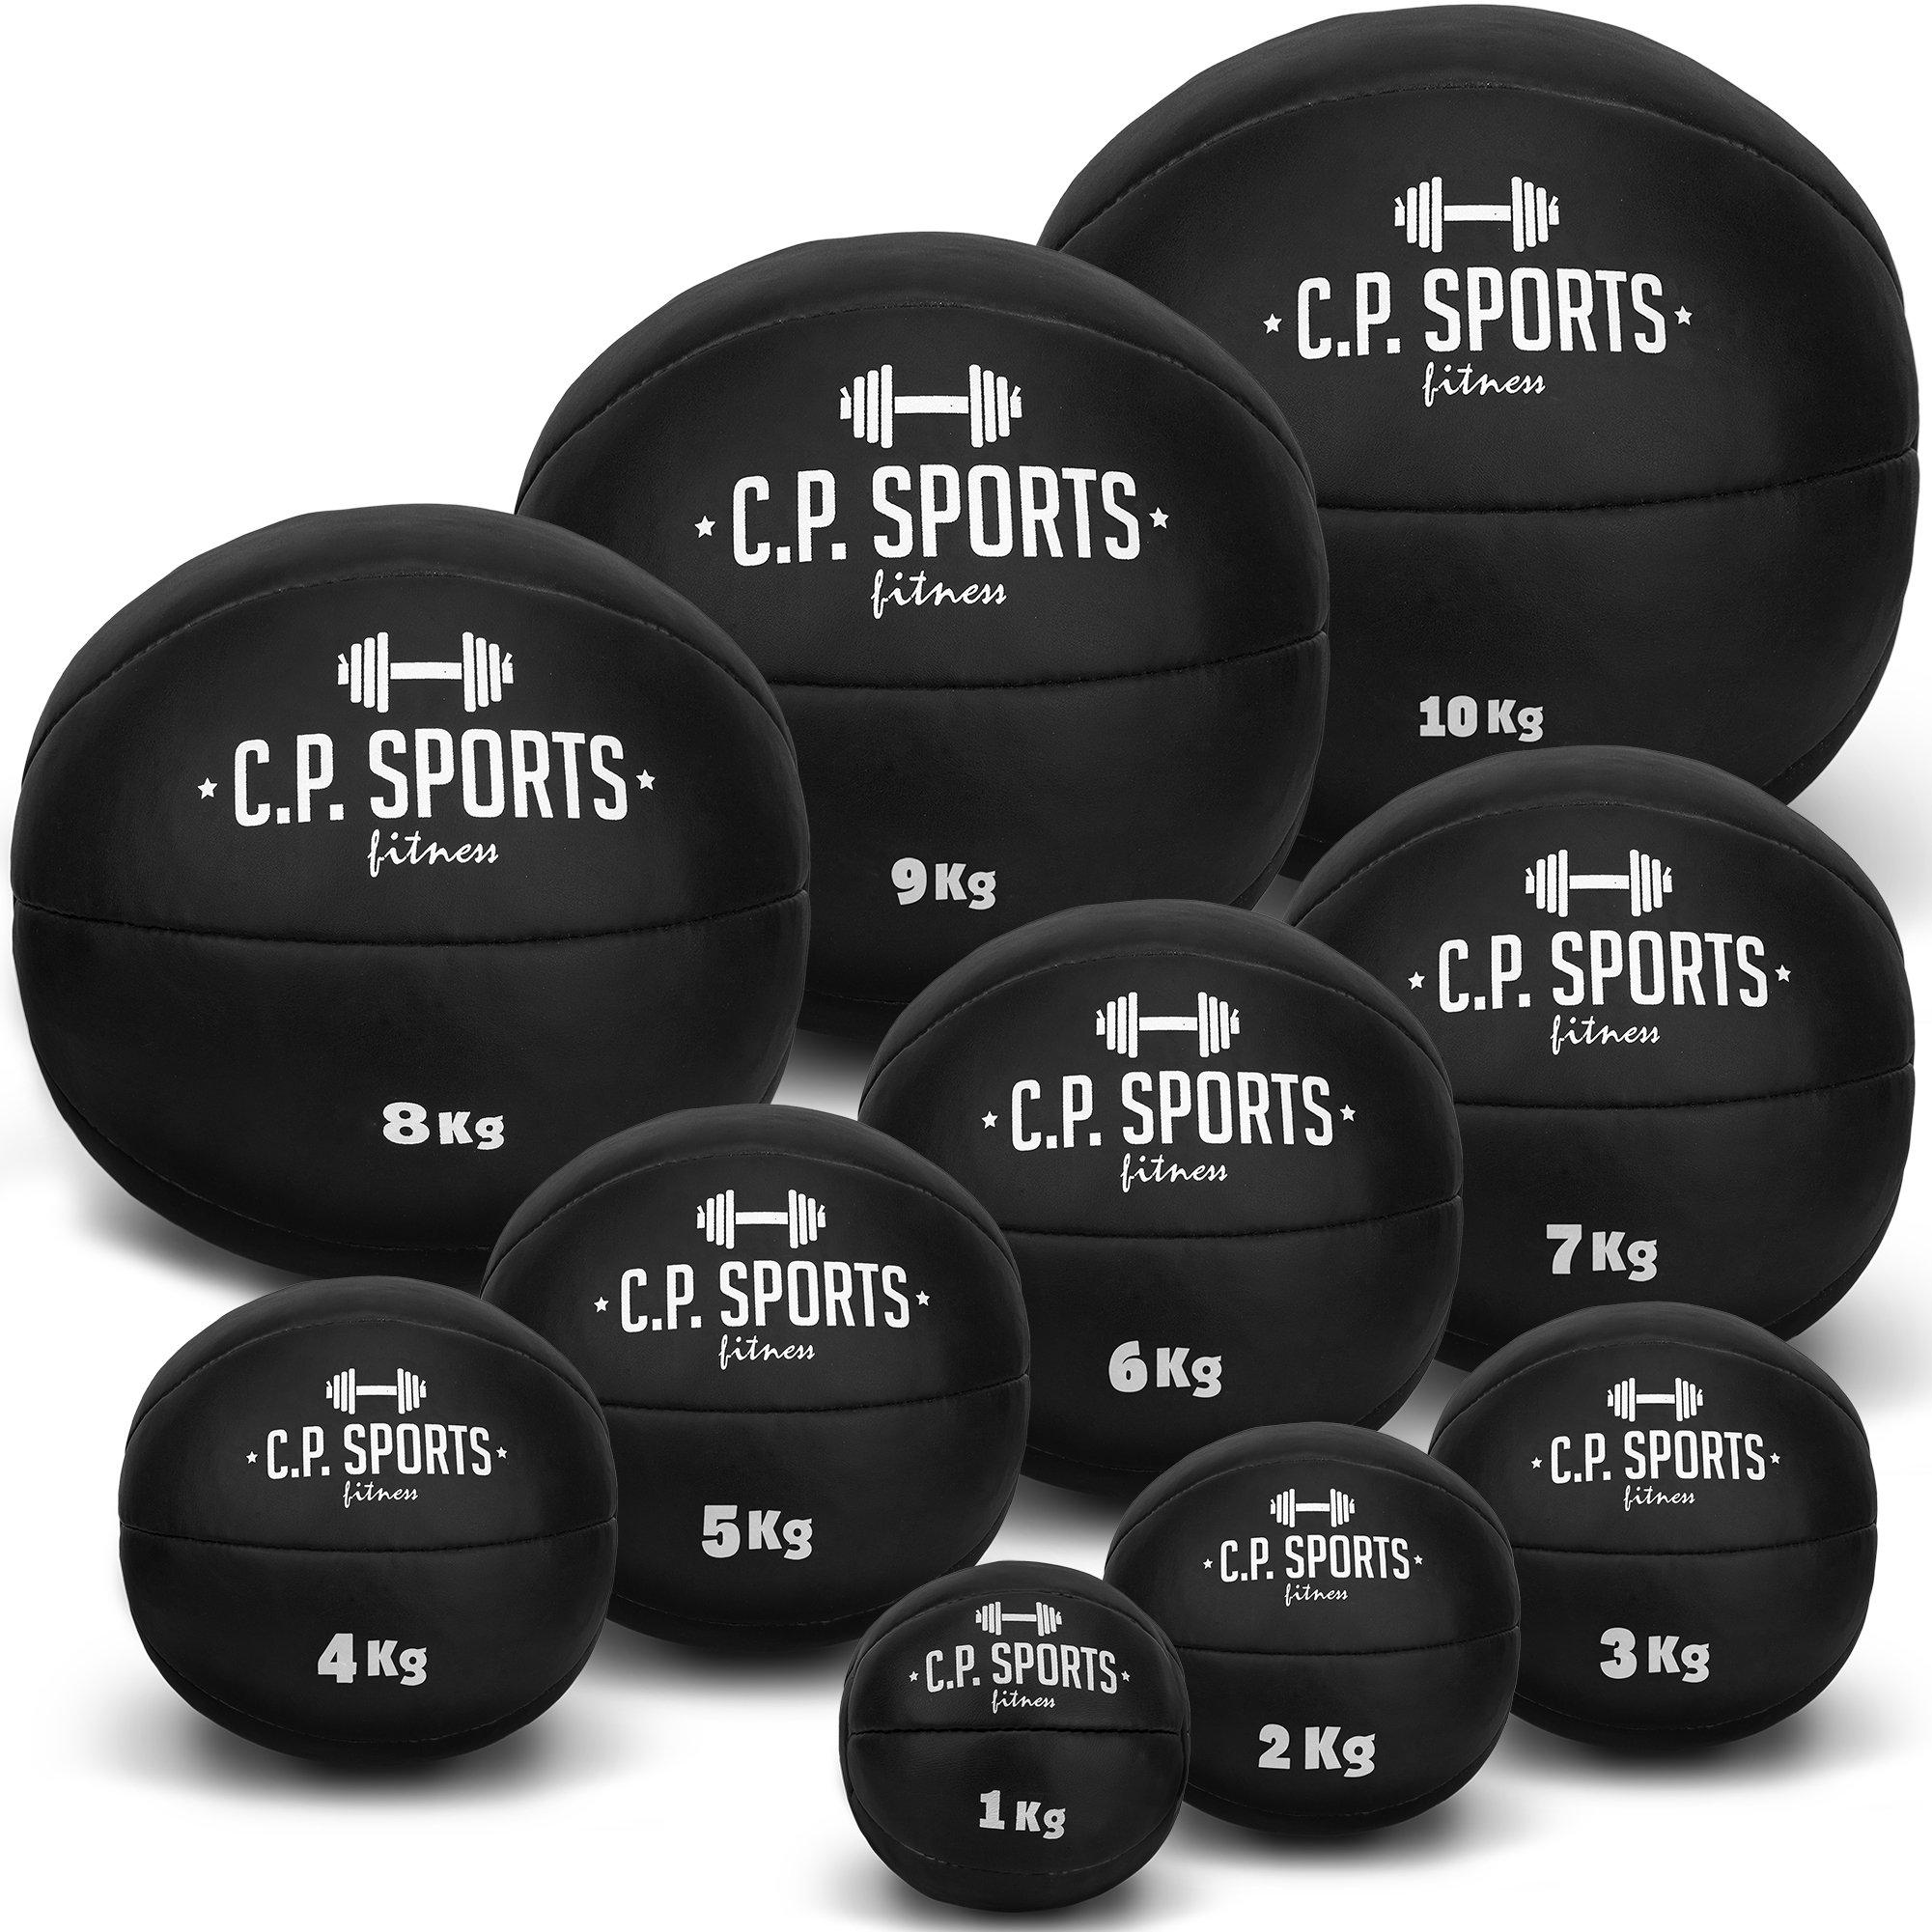 C.P. Sports Balón Medicinal Set 1 – 10 kg, peso Ball, balones ...